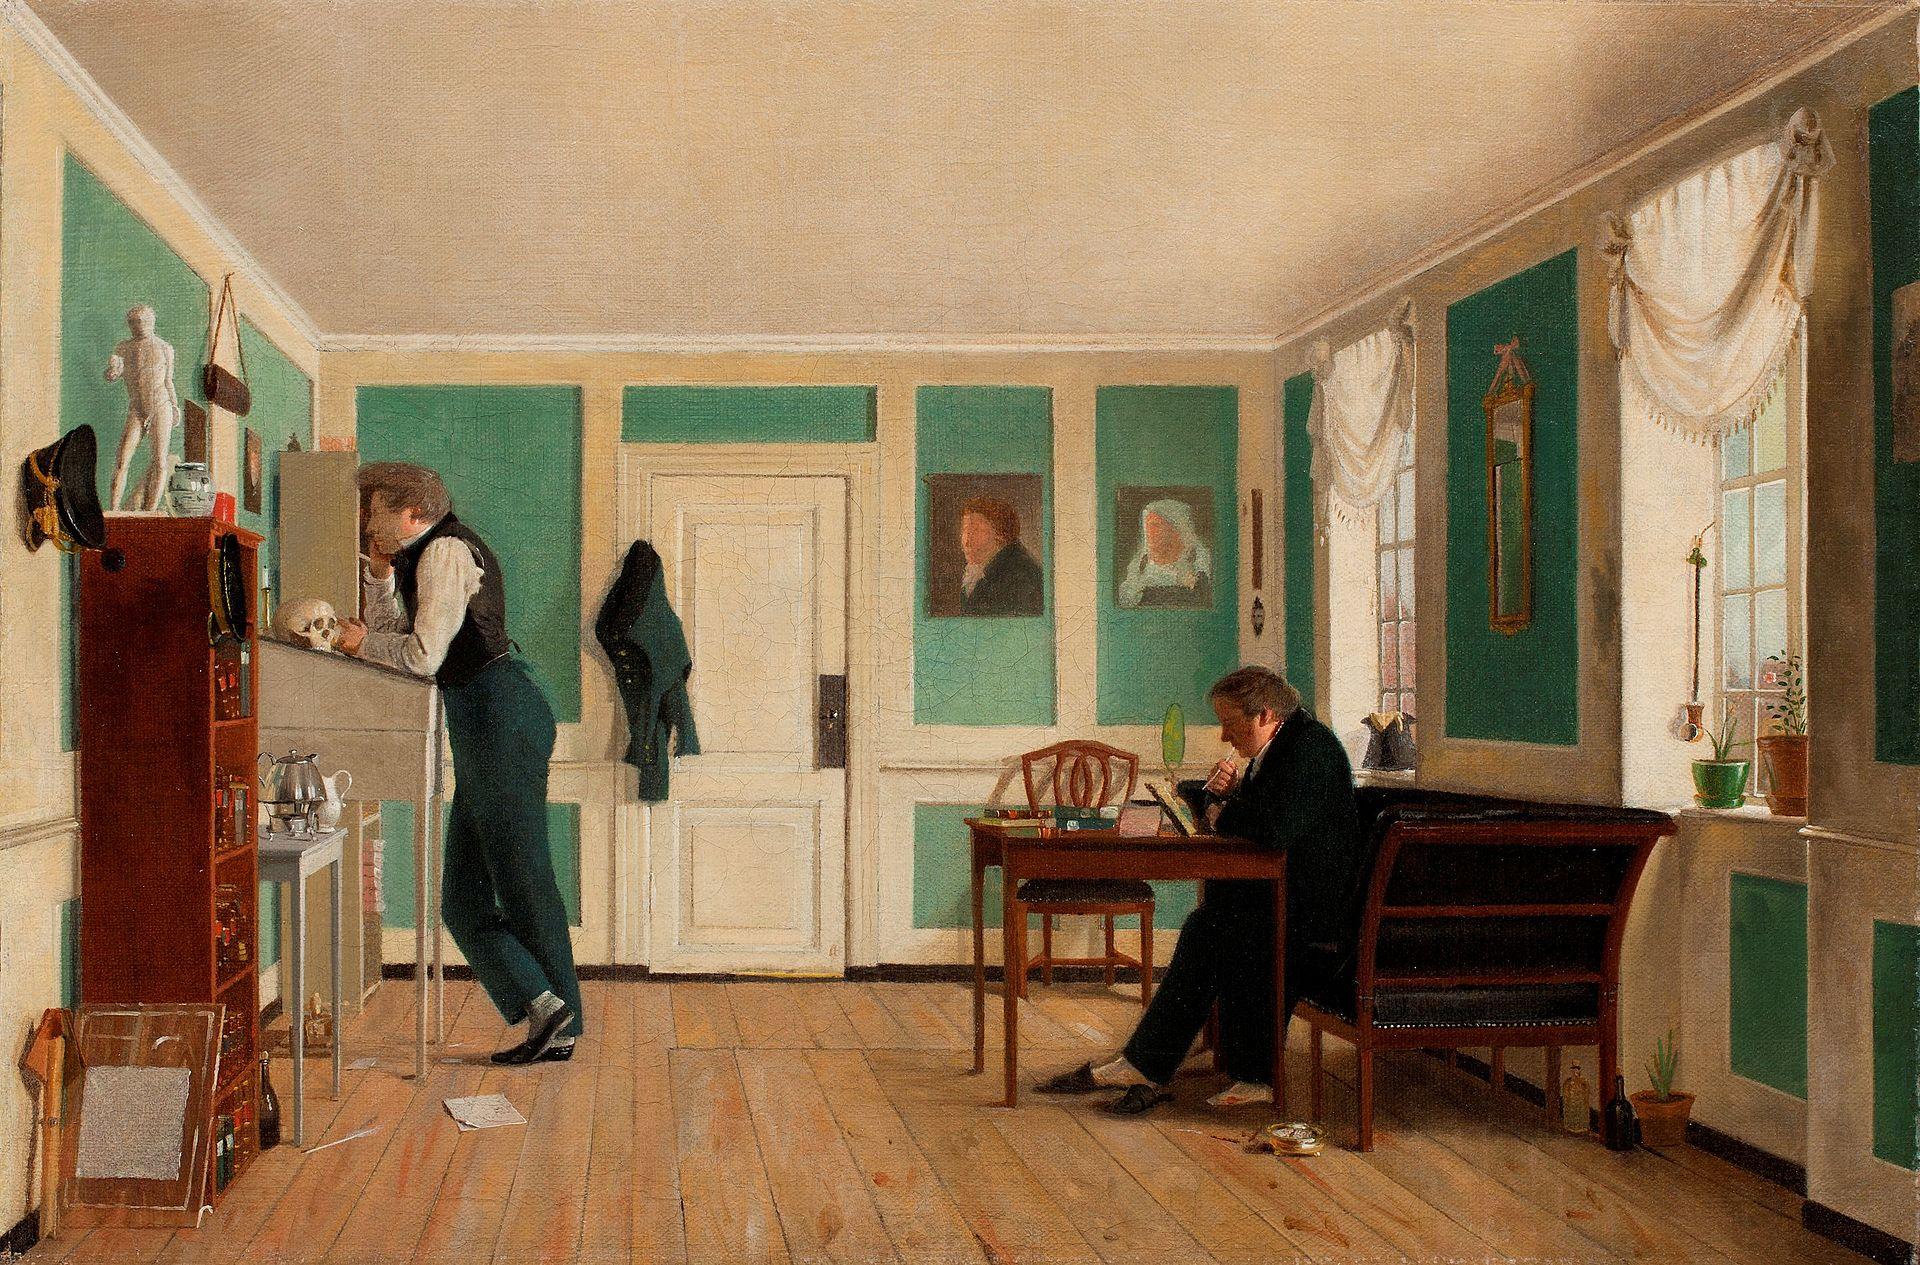 Wilhelm_Bendz,_Interiør_fra_Amaliegade,_ca._1829.jpg